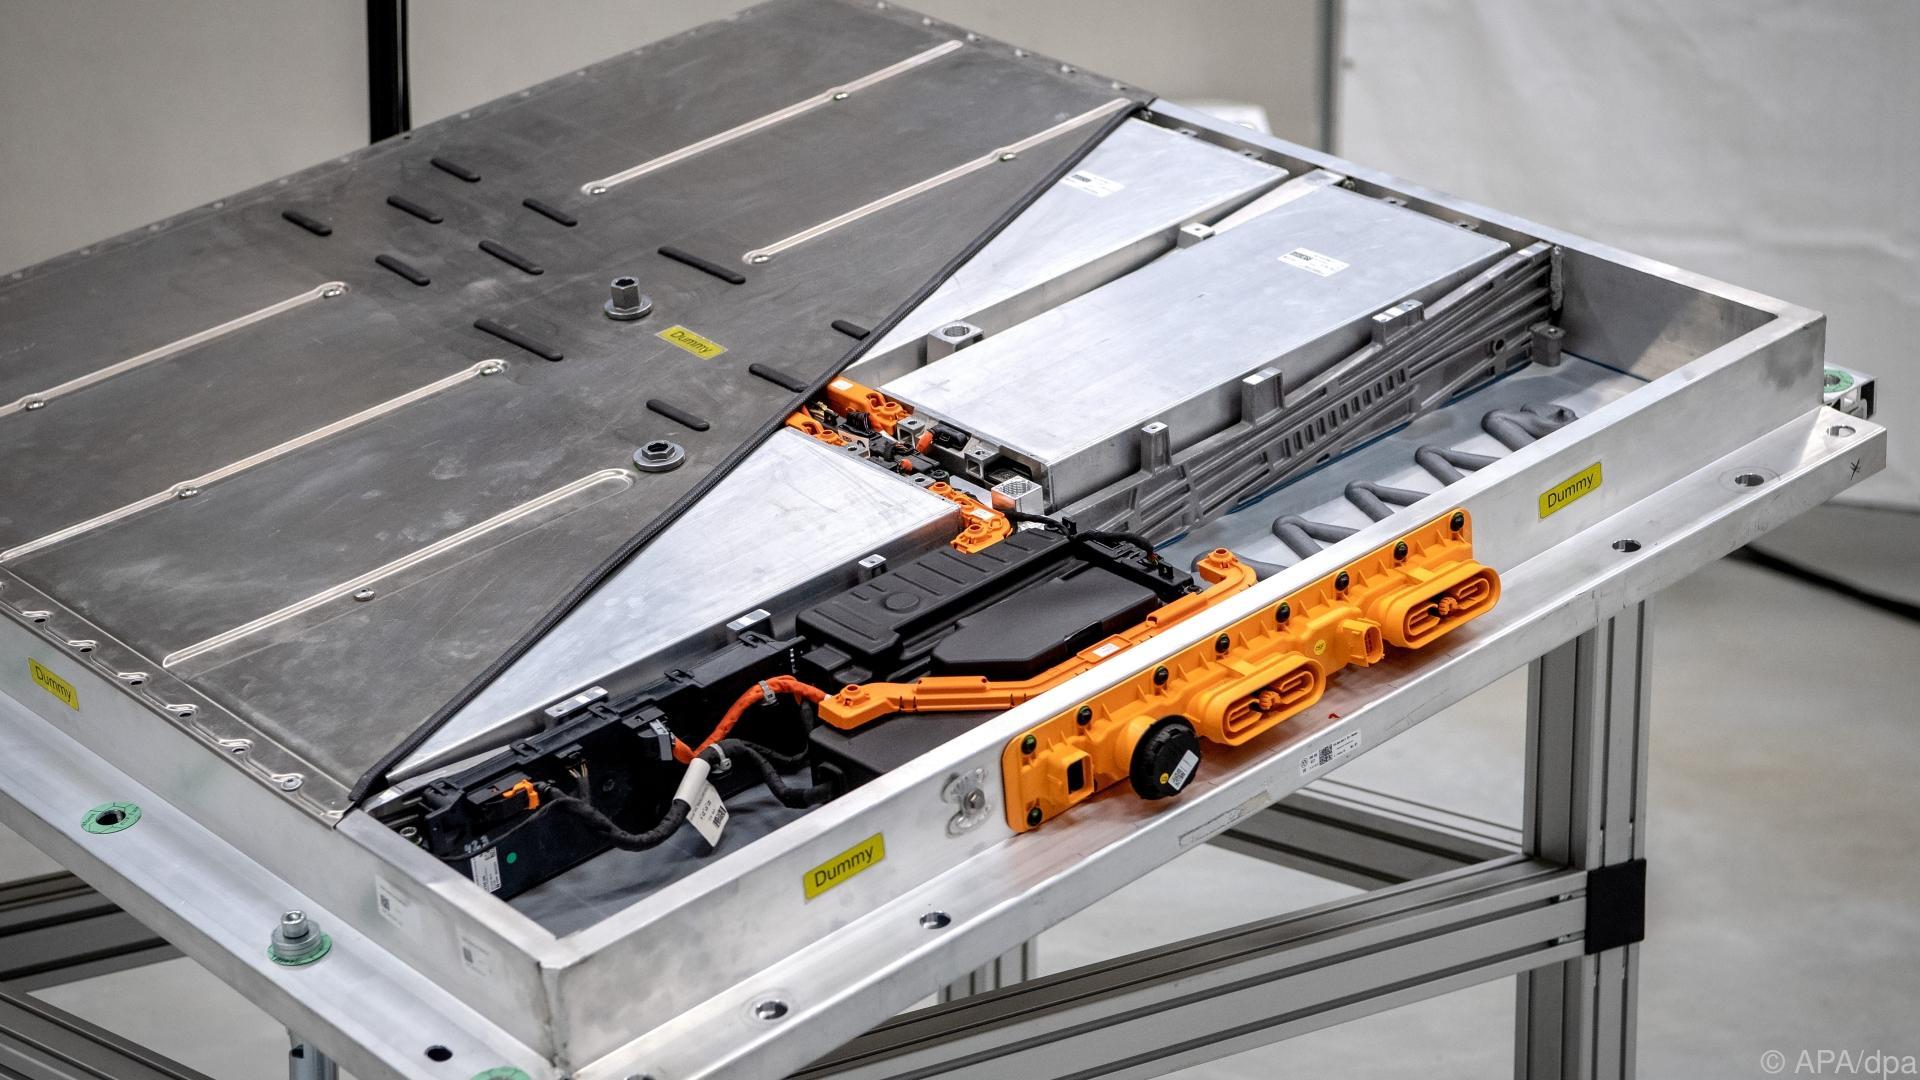 Northvolt-Chef stellt Börsengang des Batterieherstellers in Aussicht